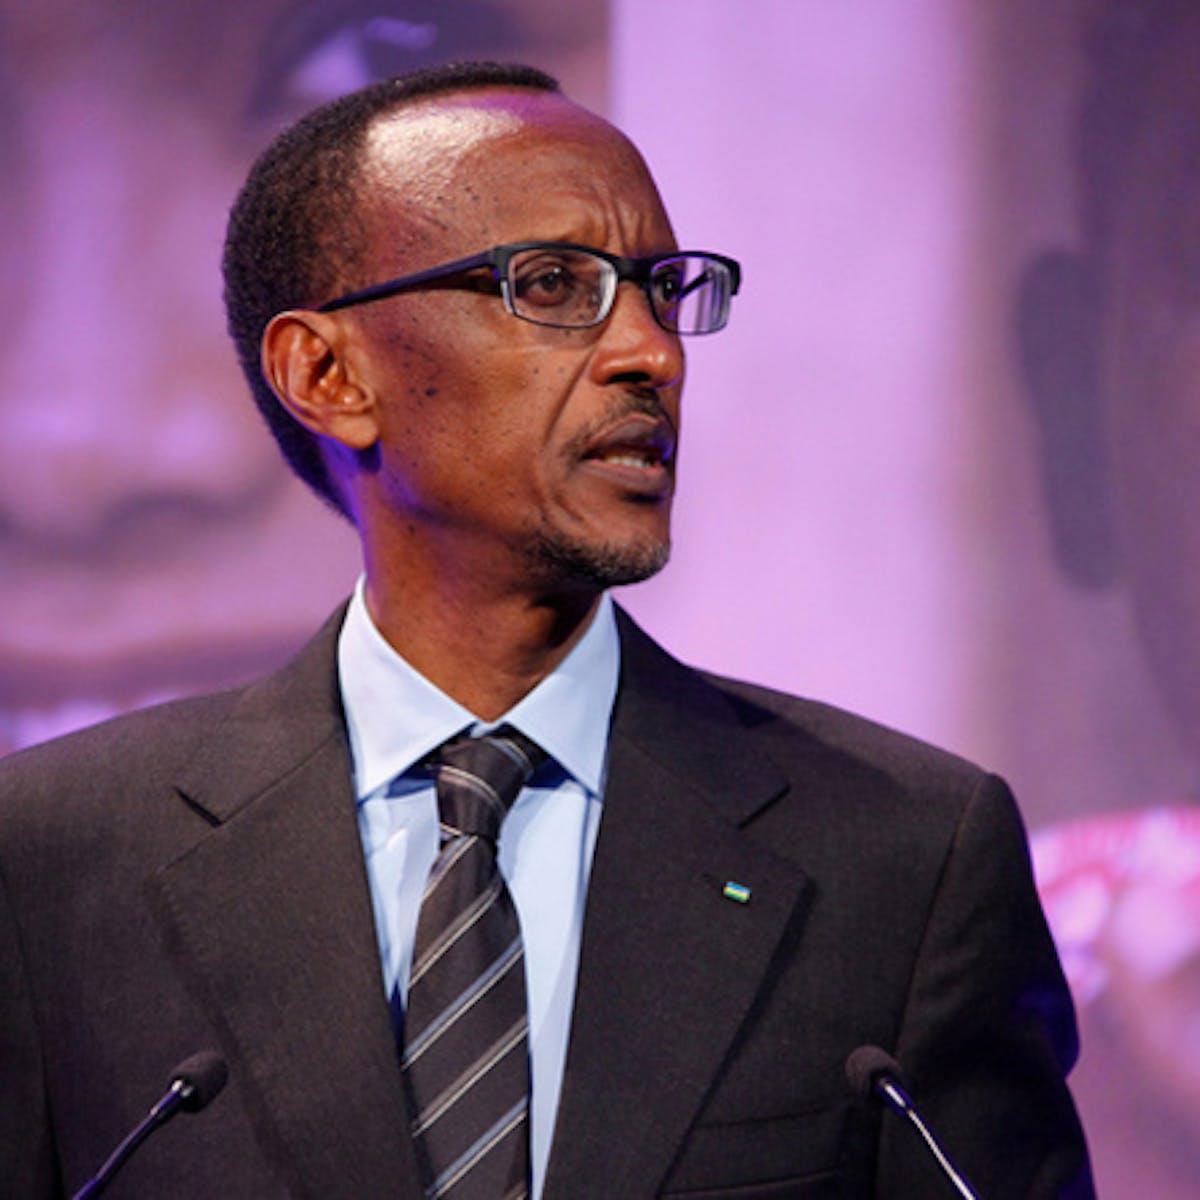 Kagame set to jail hotelier who saved Rwandan Tutsis